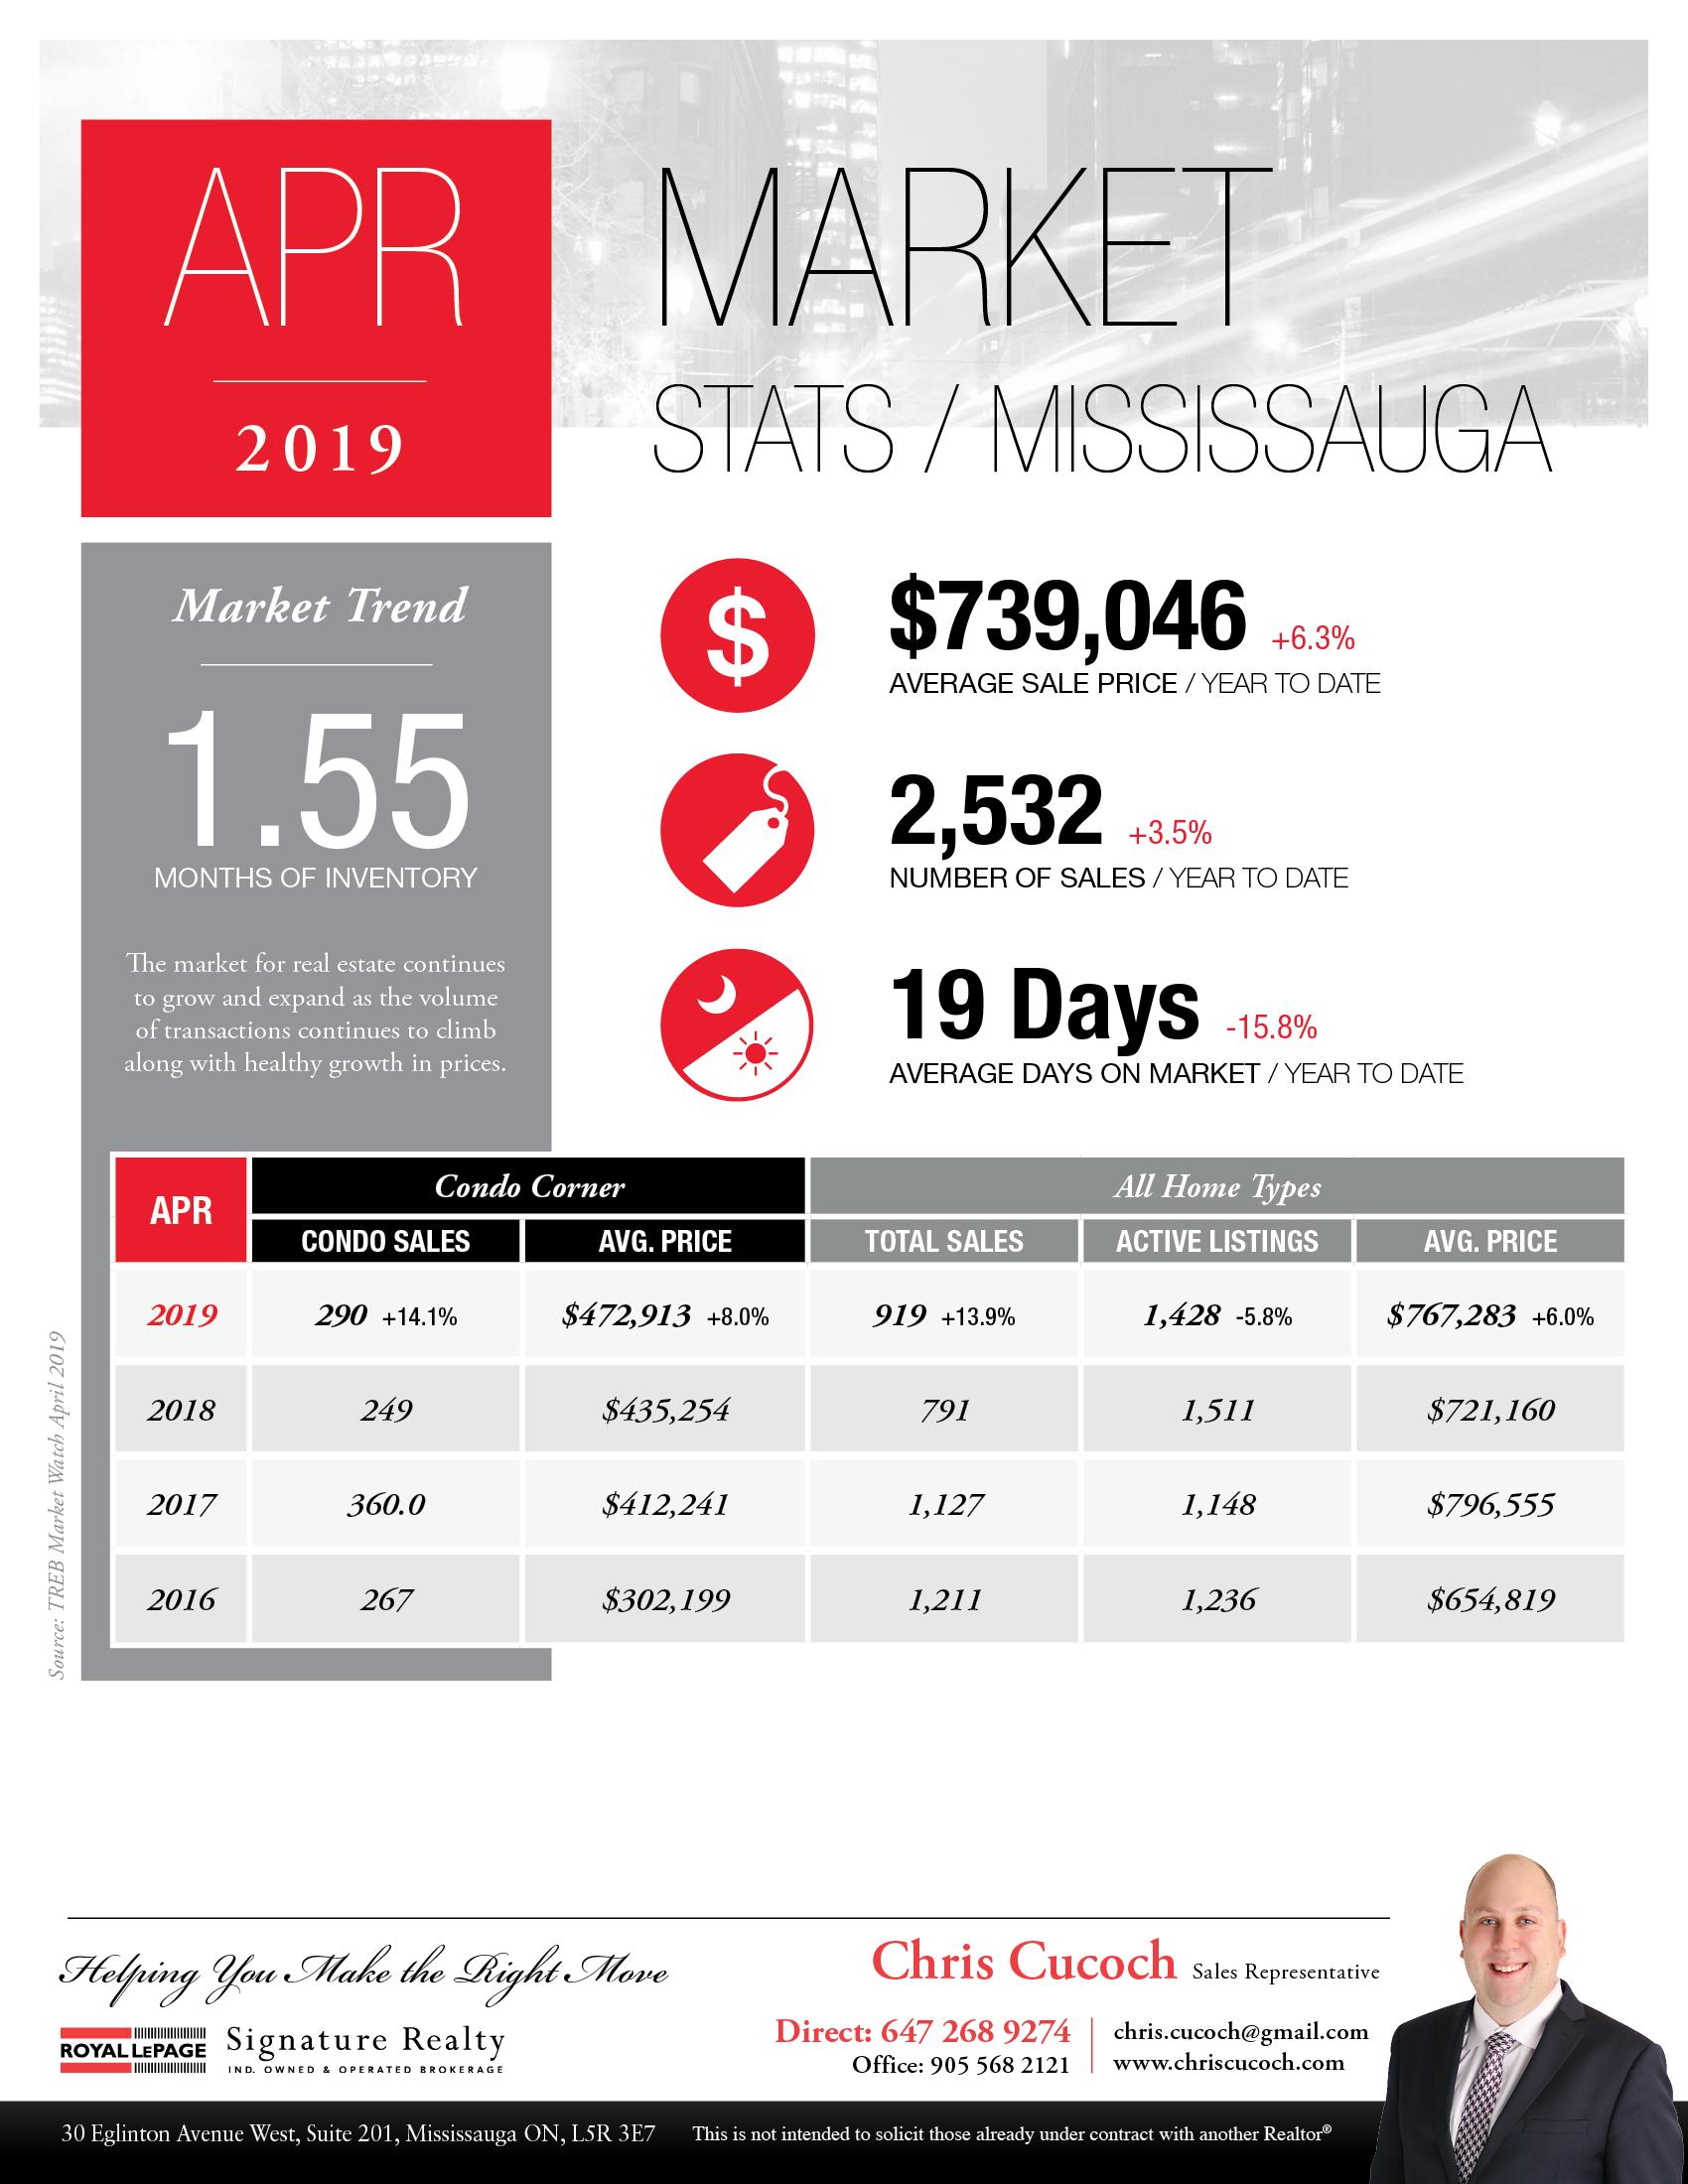 Mississauga Real Estate Market Statistics Infographic for April 2019